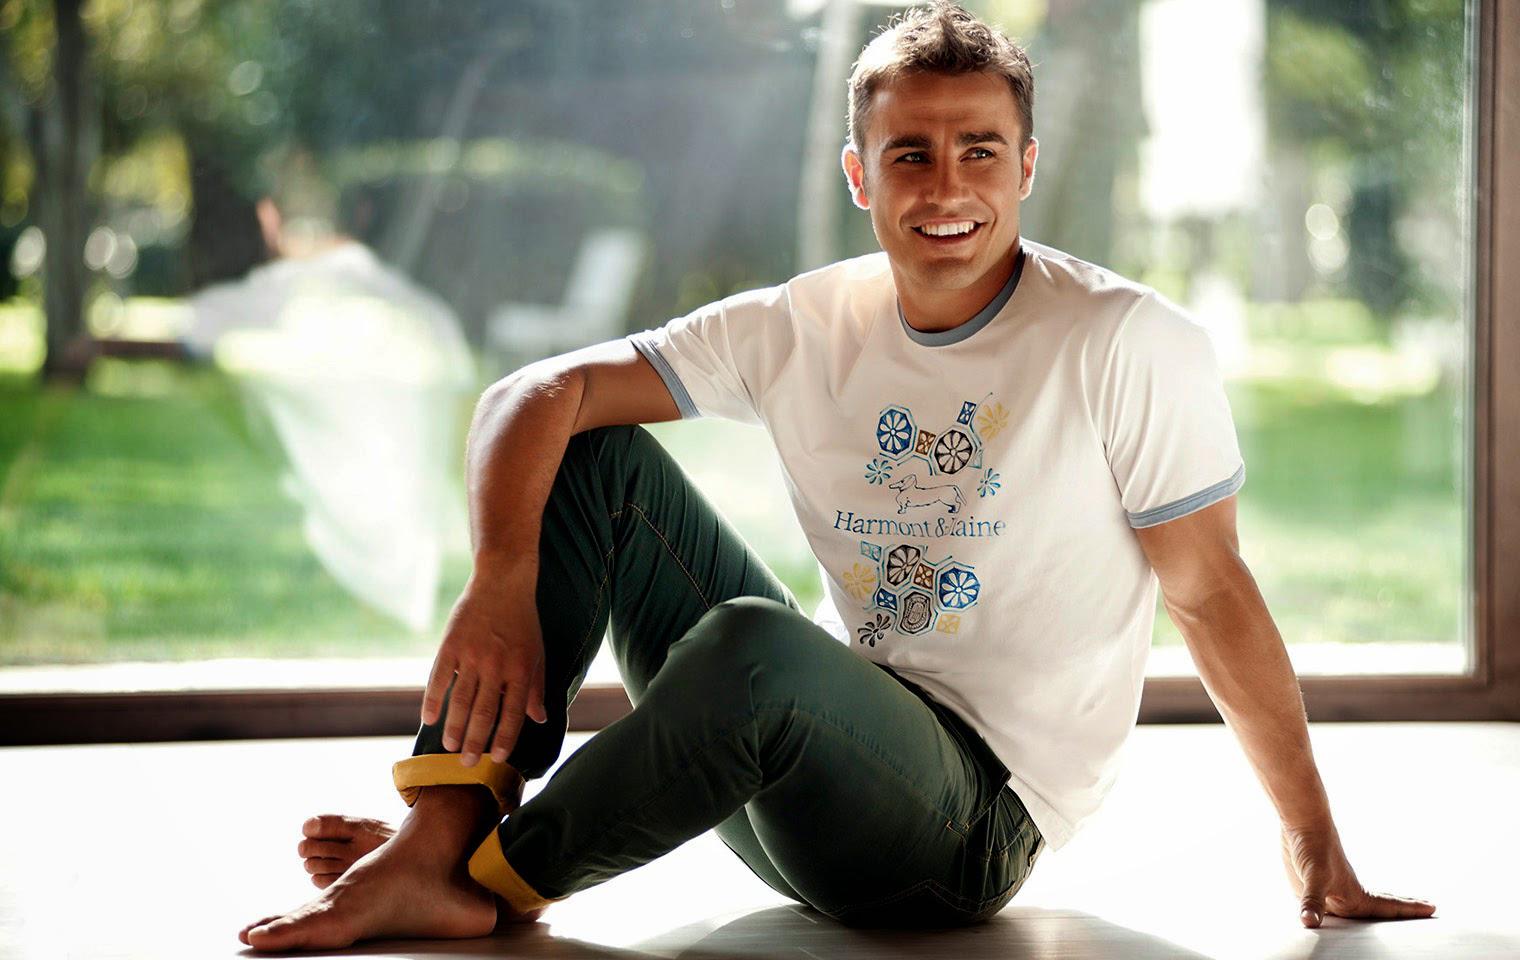 Straight Jock Feet My Favorite Fabio Cannavaro-5567